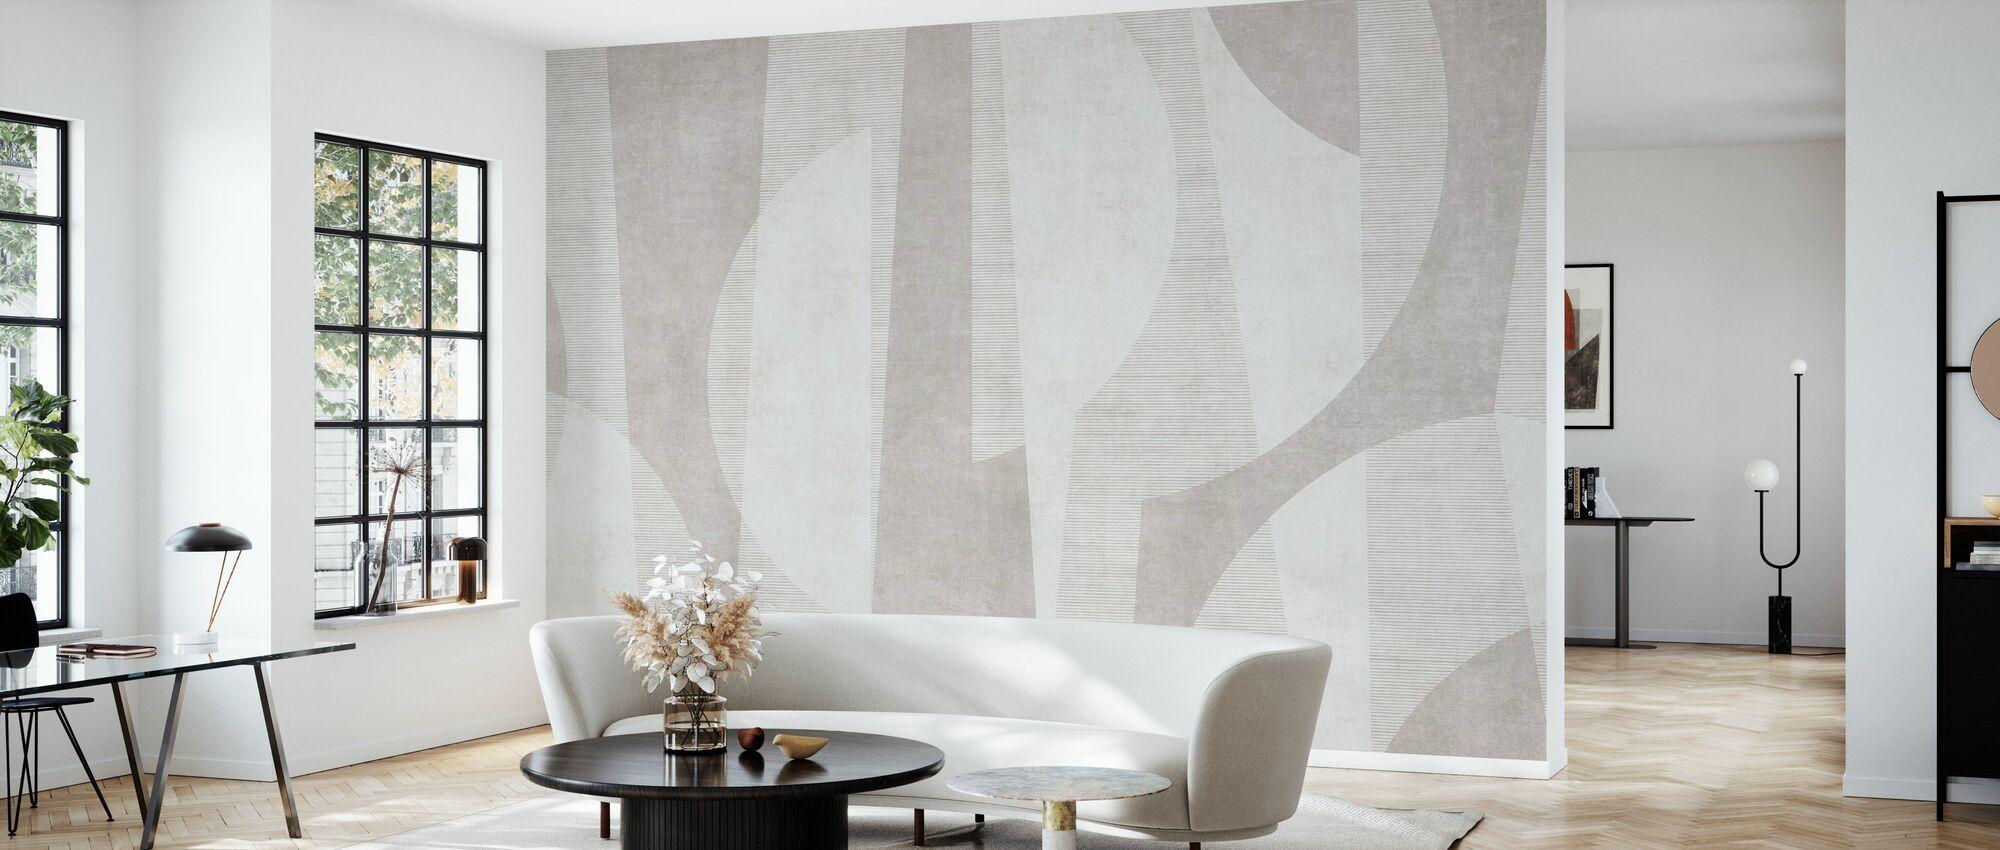 Ipanema Beach - Beige - Wallpaper - Living Room